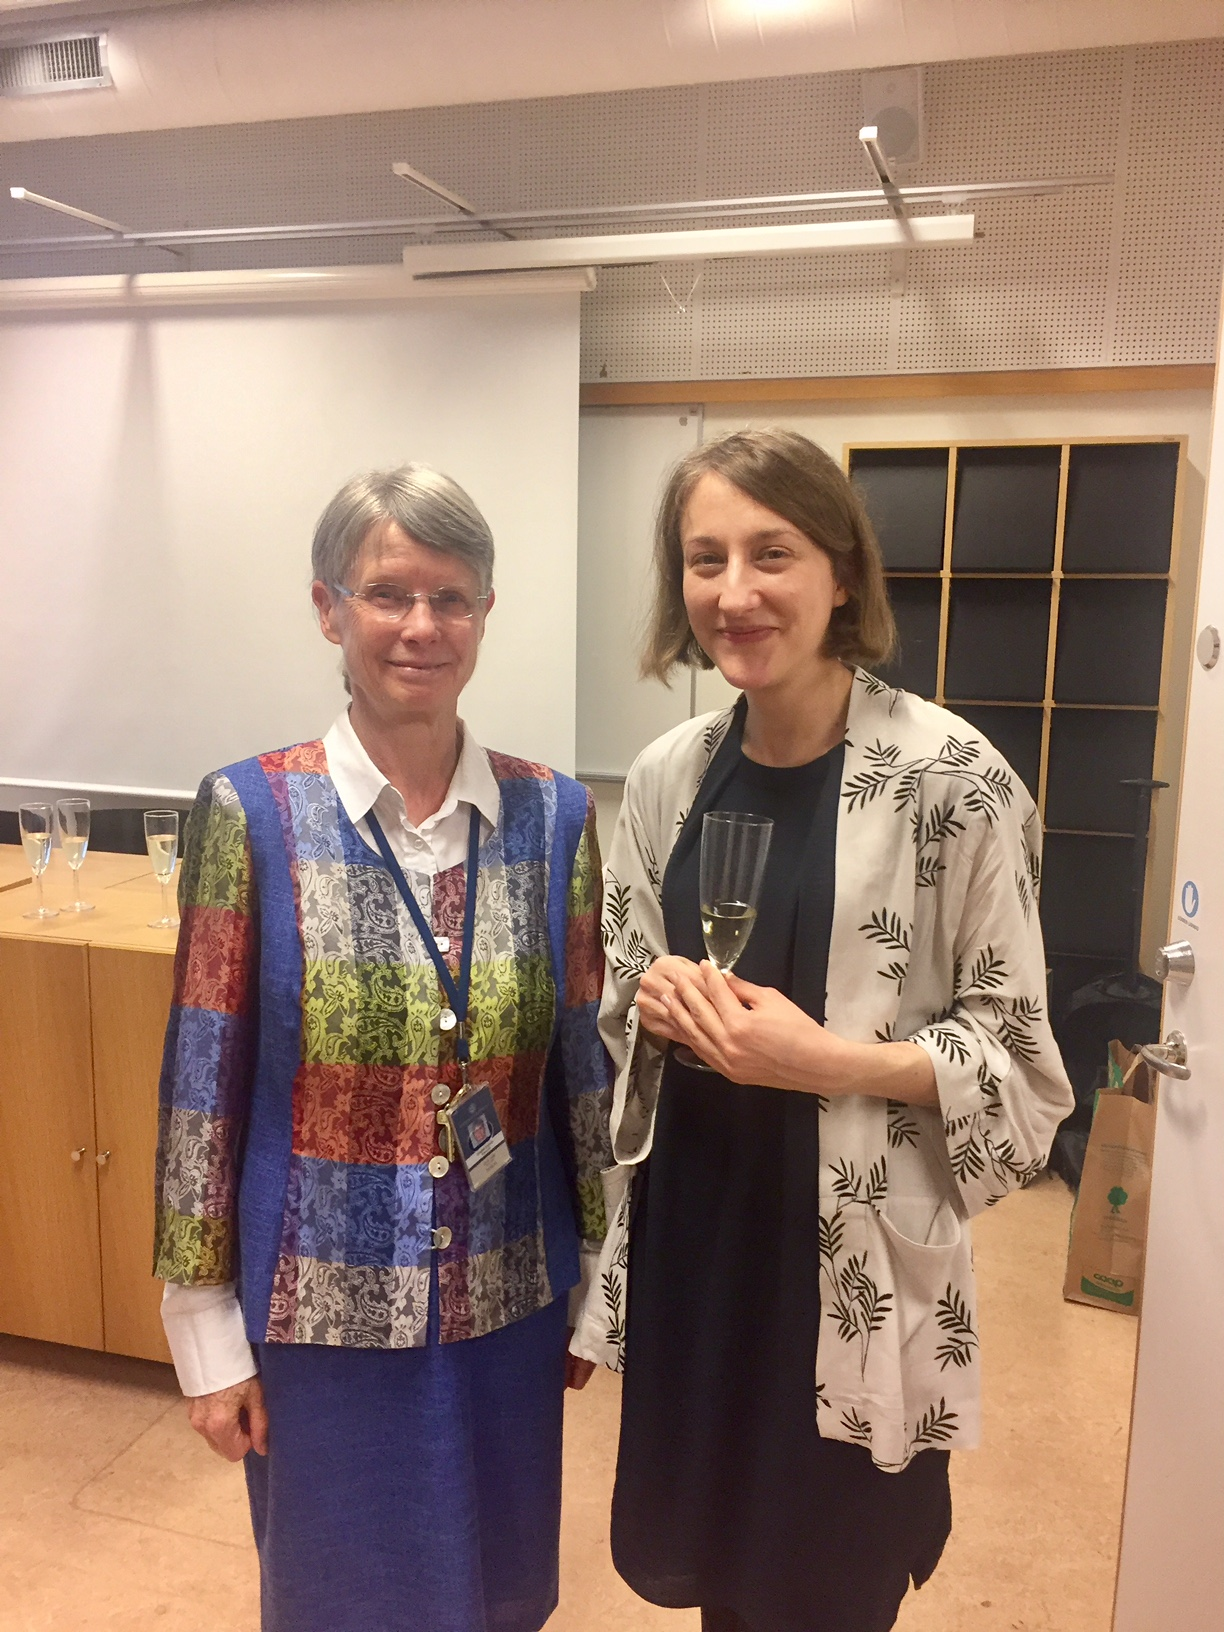 Filippa Lindahl and Elisabeth Engdahl